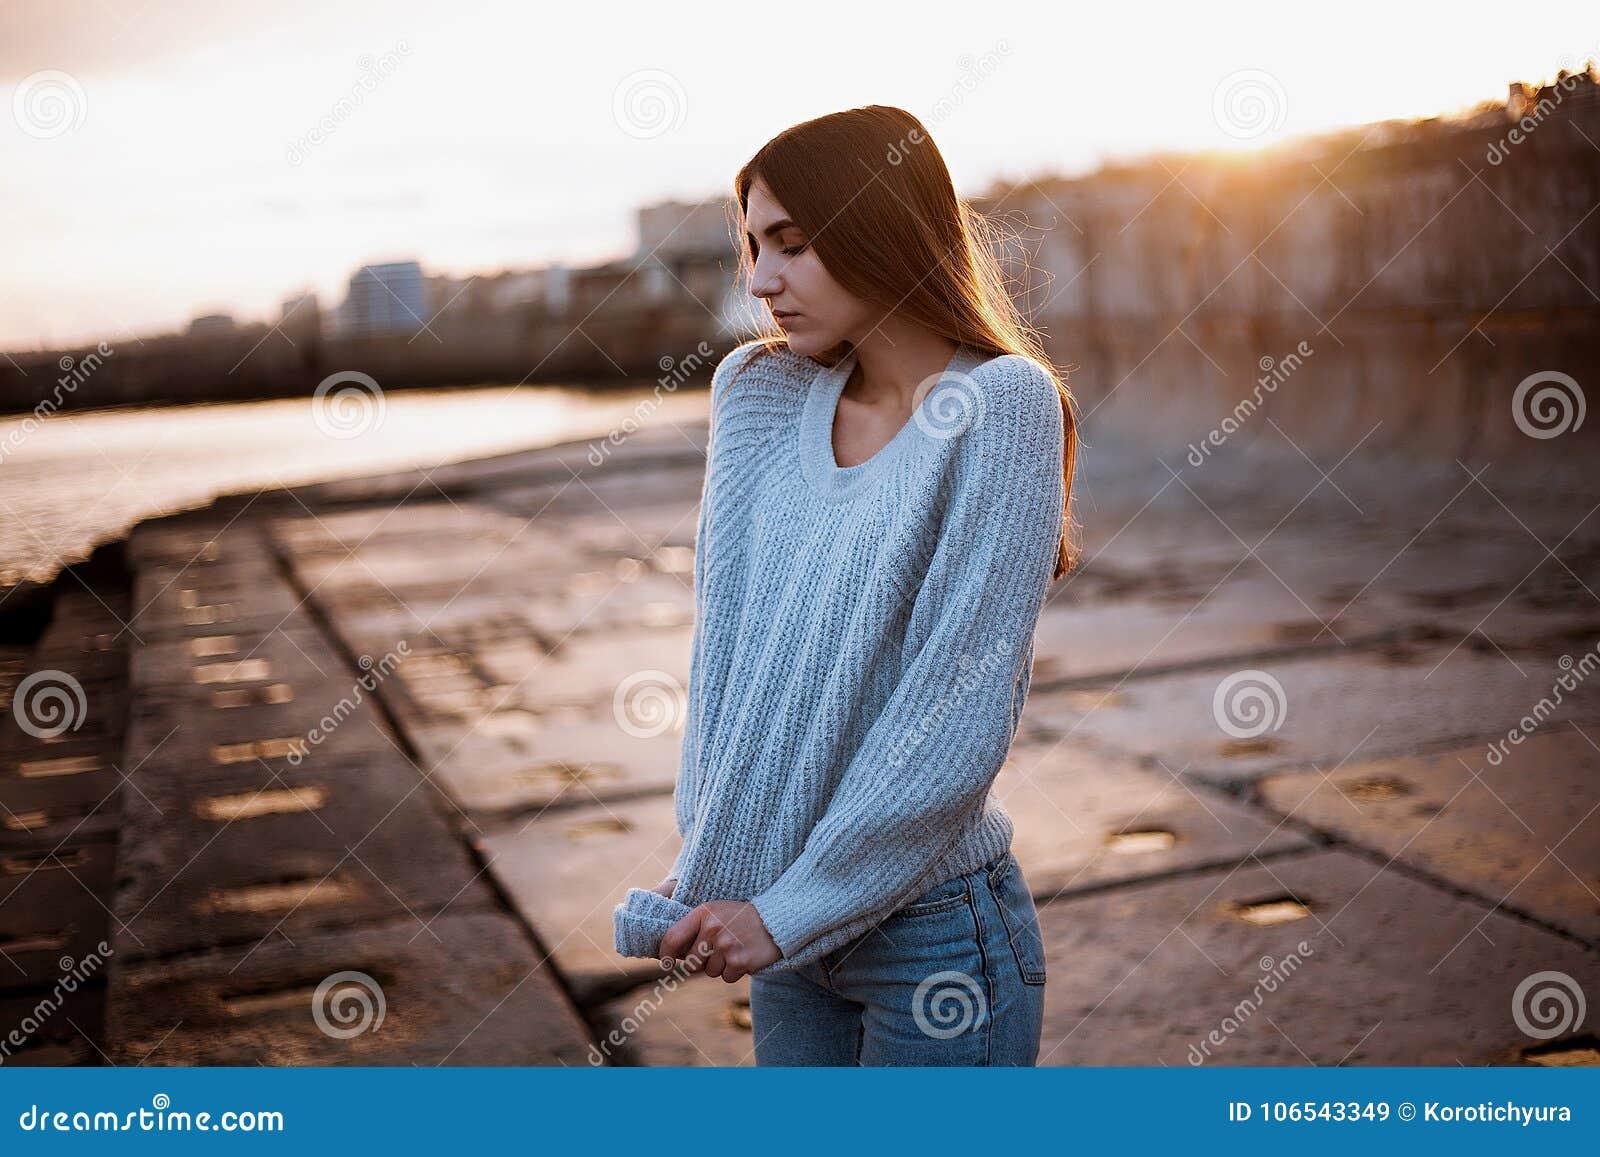 daffa0c966d2 Κορίτσι σε ένα πουλόβερ κοντά στη θάλασσα Στοκ Εικόνα - εικόνα από ...